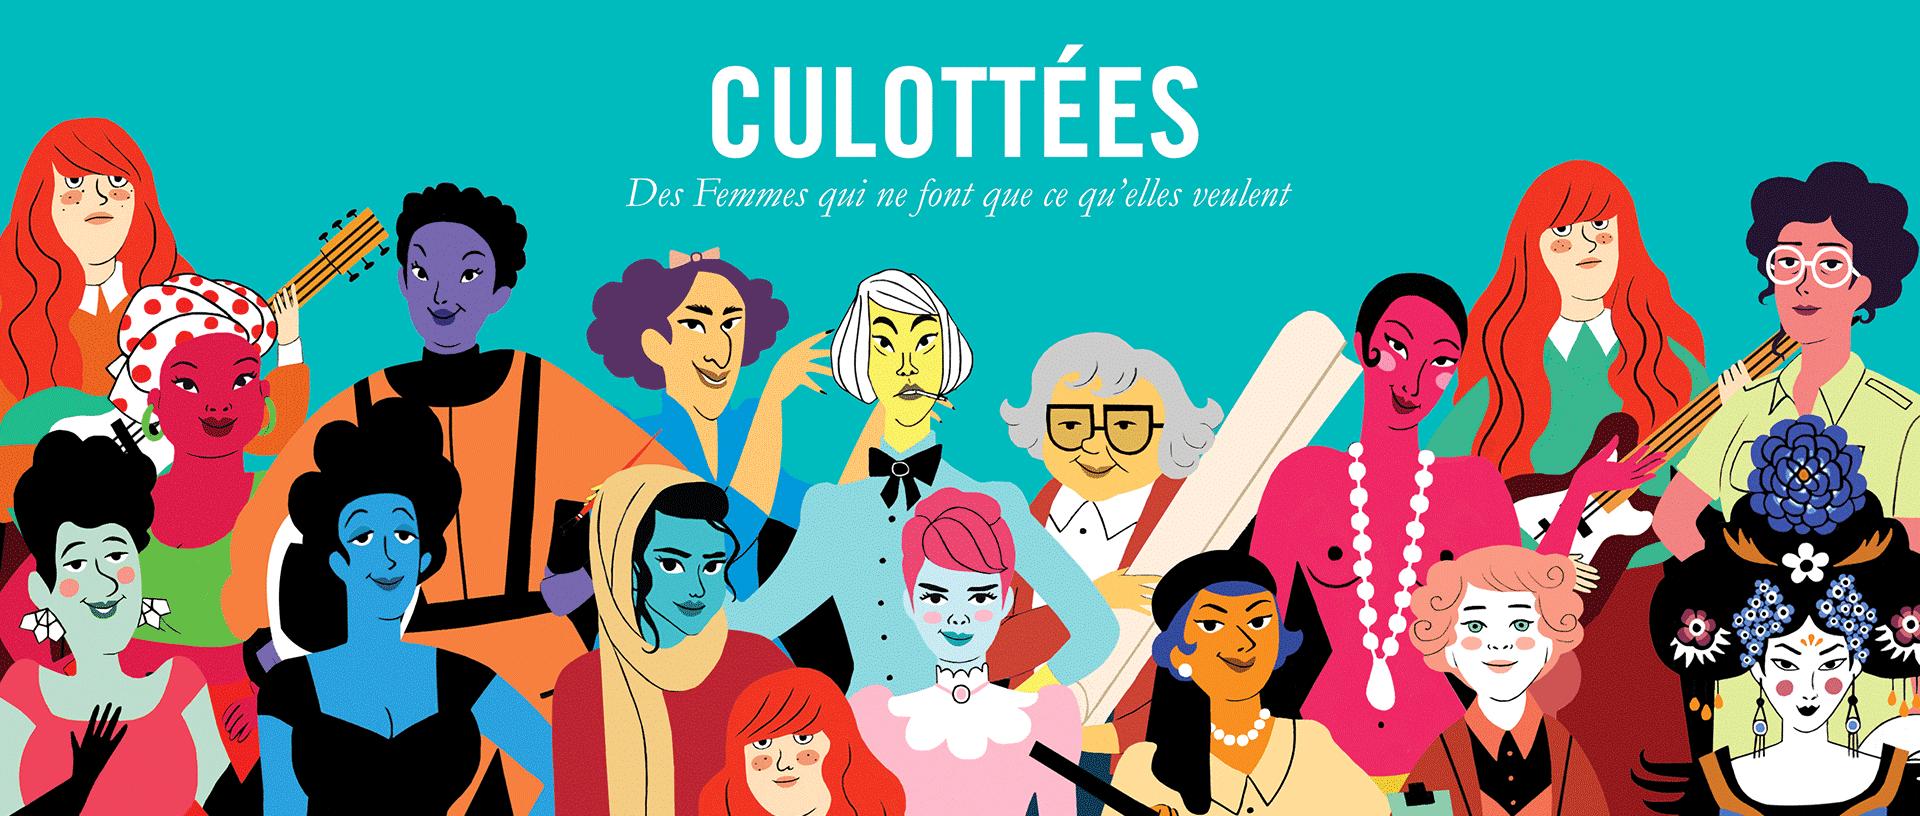 slide culottes